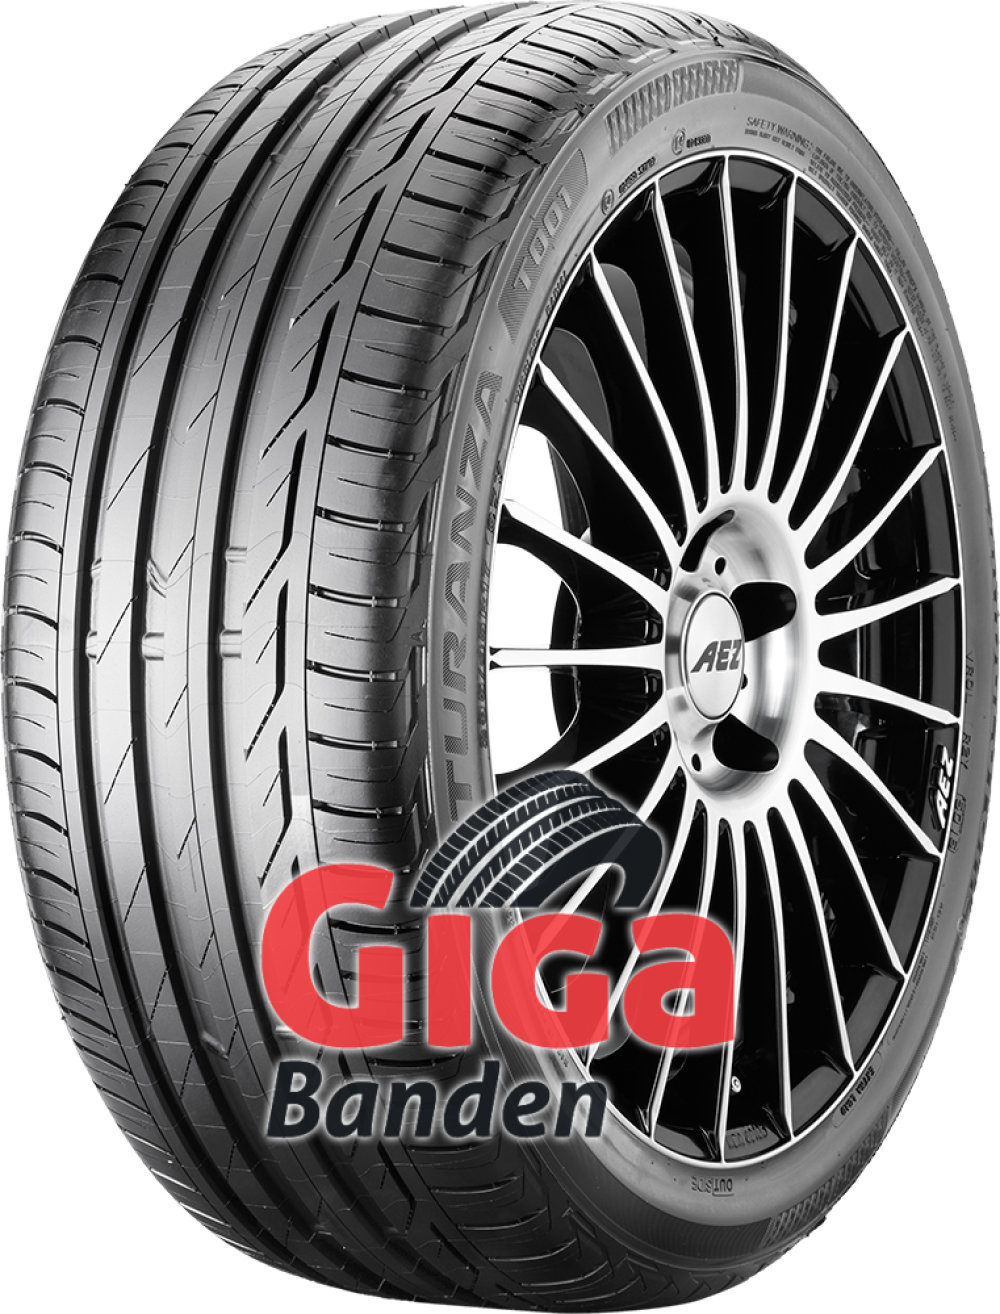 Bridgestone Turanza T001 Evo ( 195/55 R15 85V )